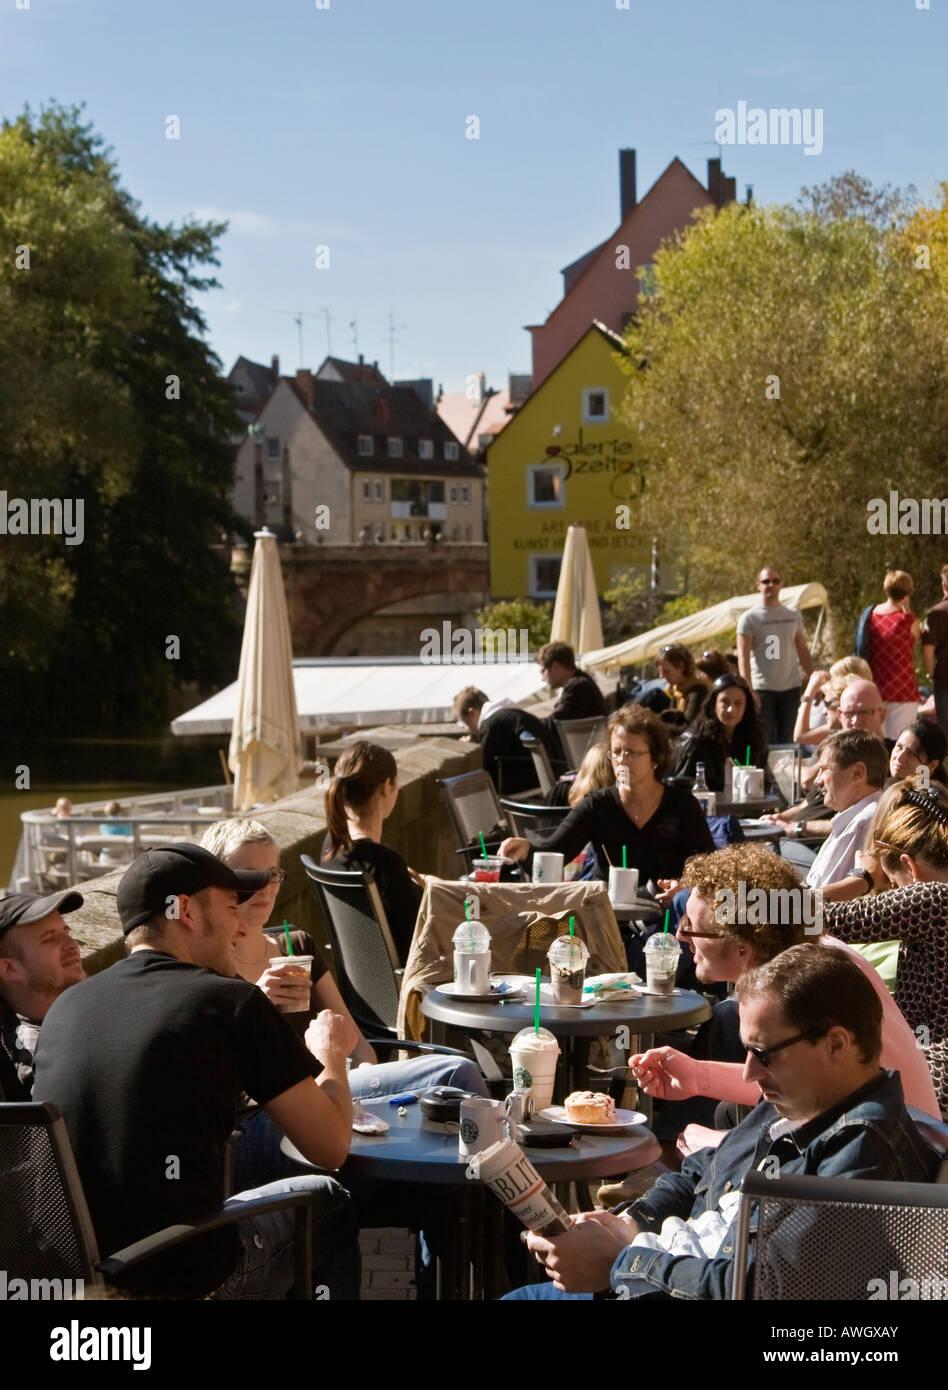 People At Riverside Starbucks Cafe Patio Pegnitz River Nuremberg Germany